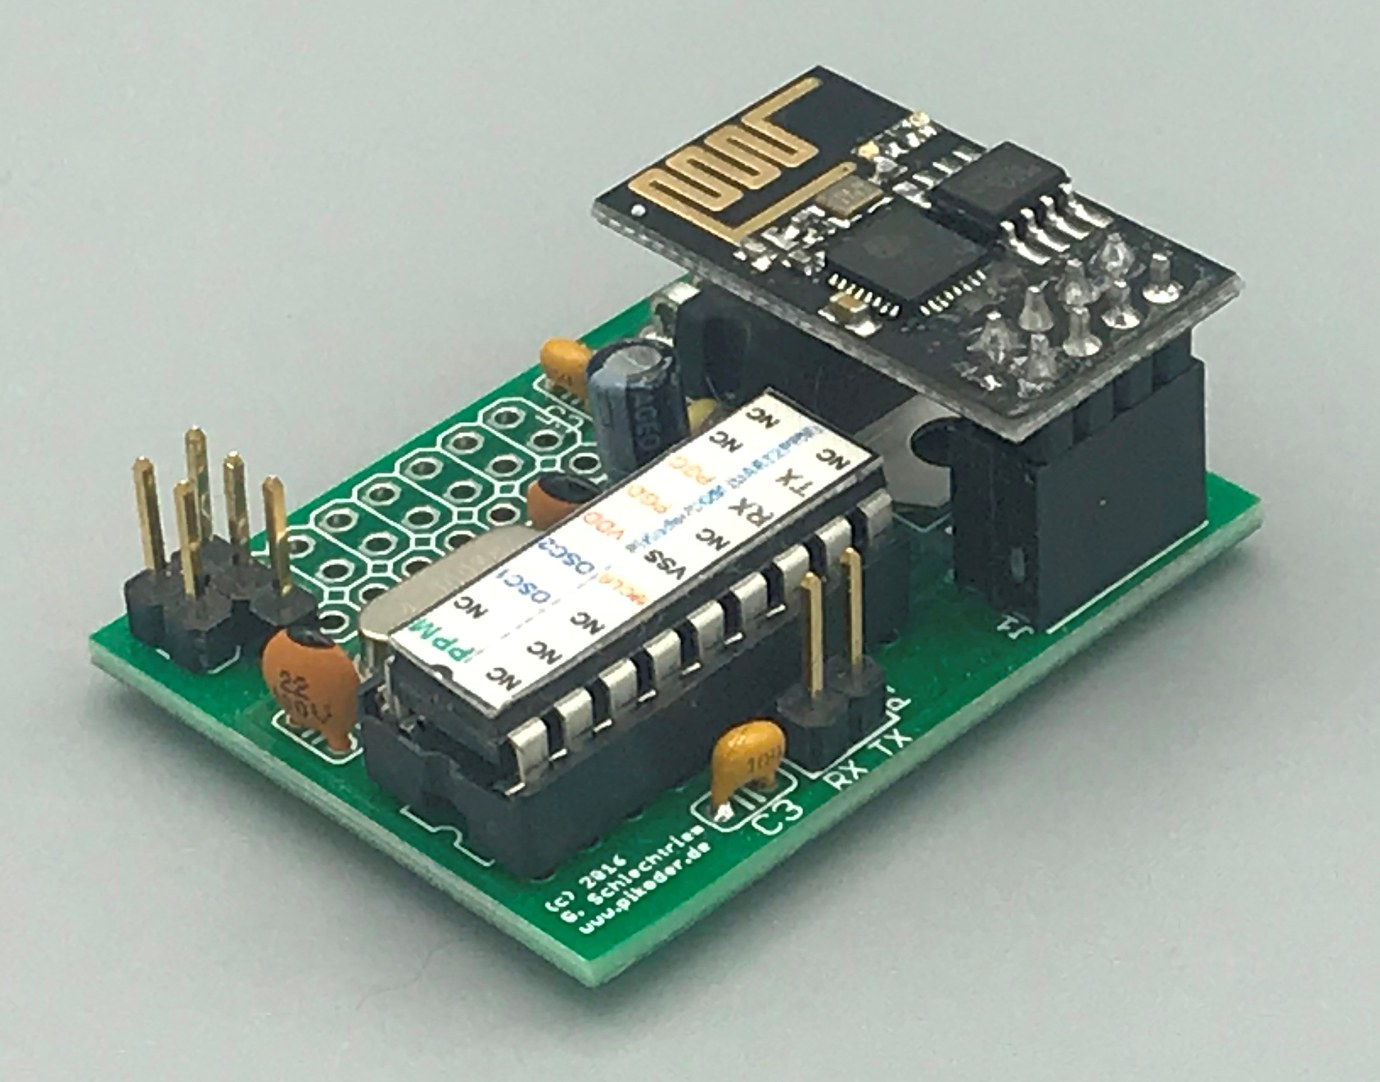 Digital PiKoder radio control